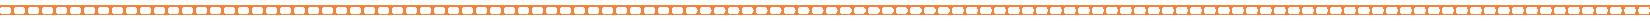 MembershipPage-ML-Line